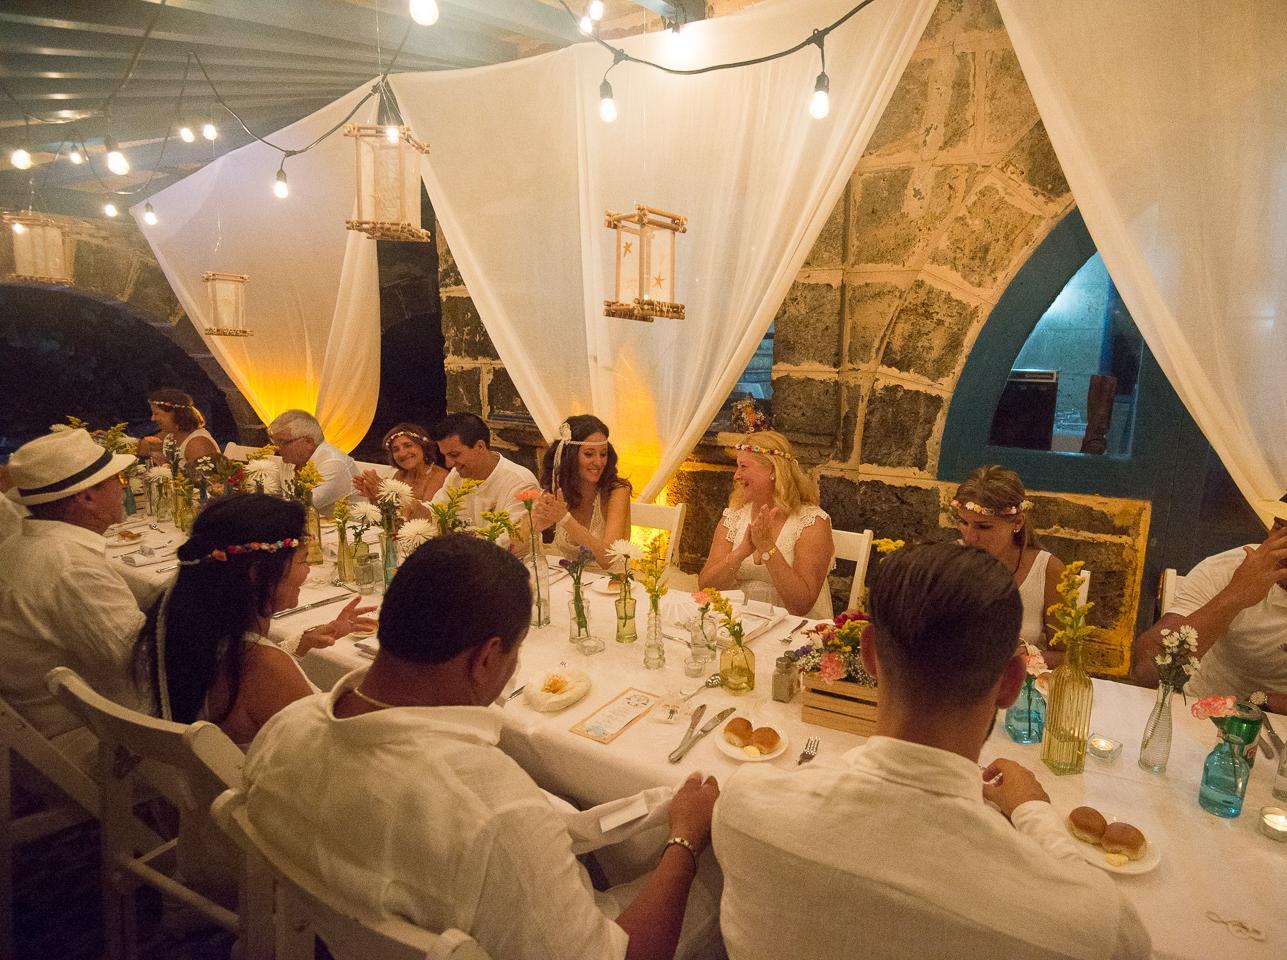 bodas-rustico-playa-cuba-2242.jpg